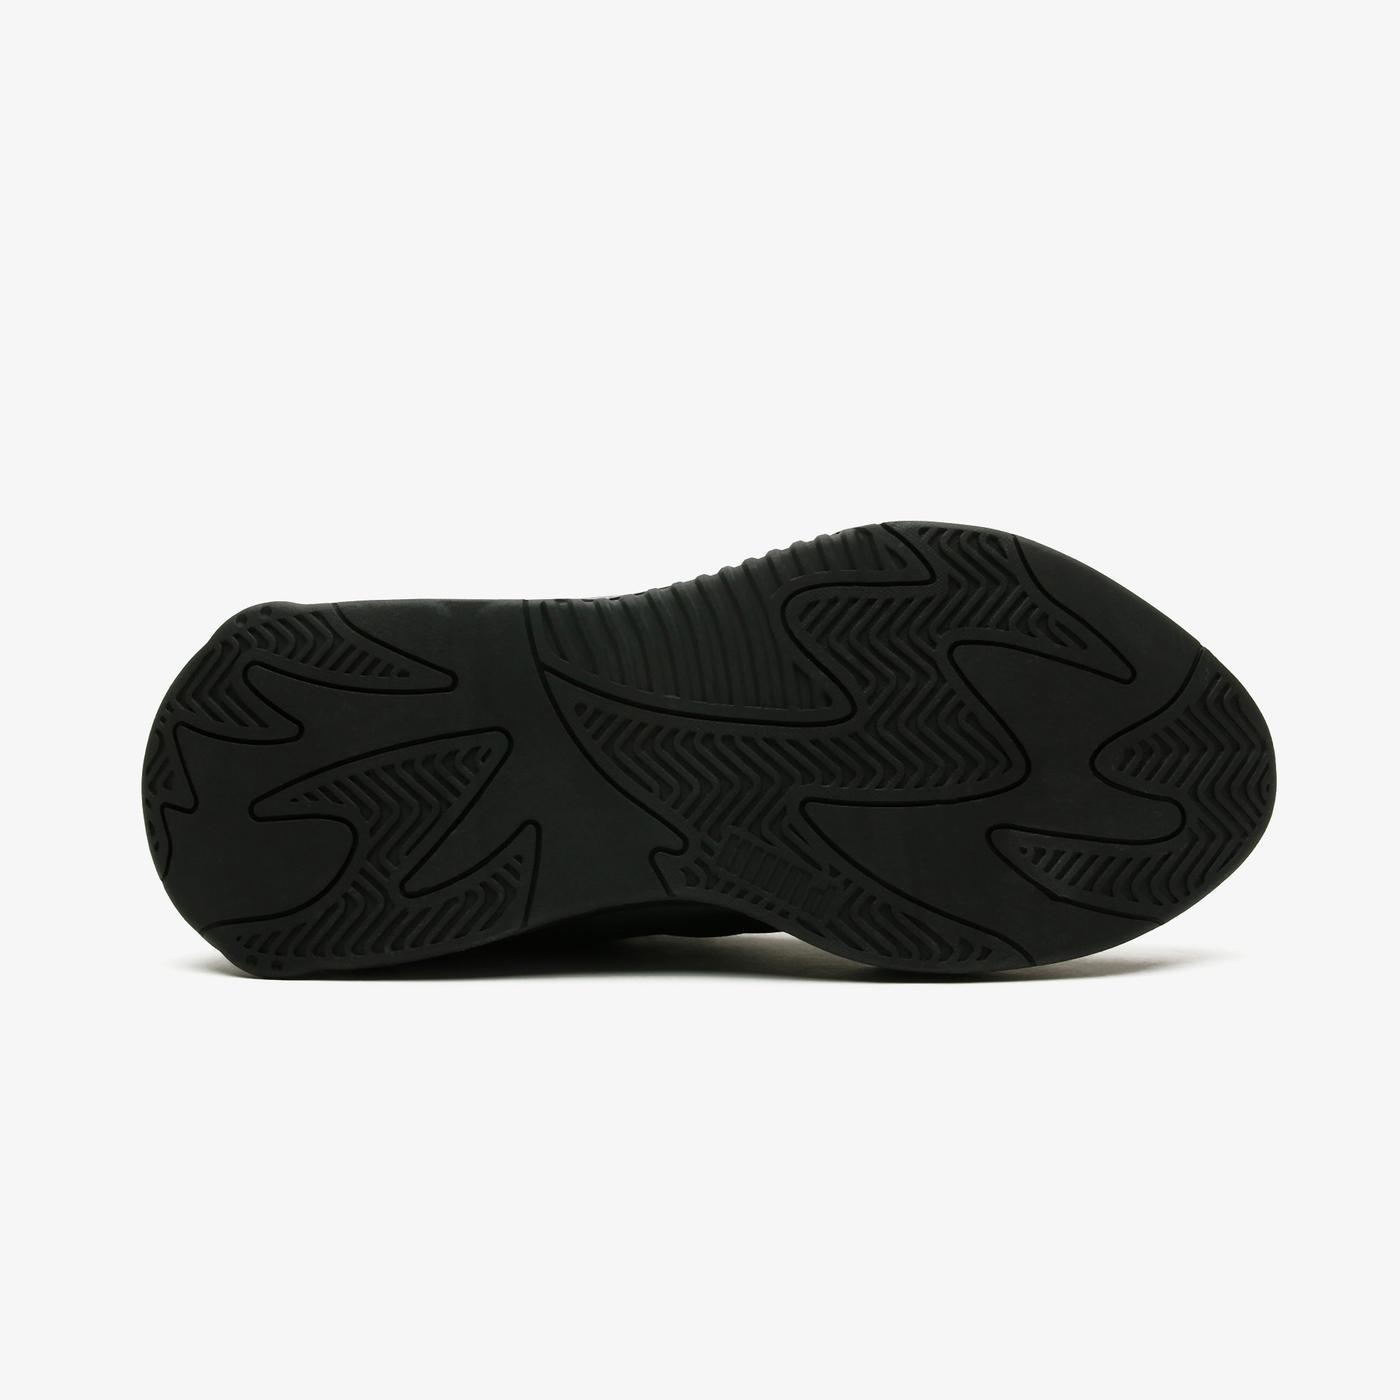 Puma RS-2K CORE Unisex Siyah Spor Ayakkabı